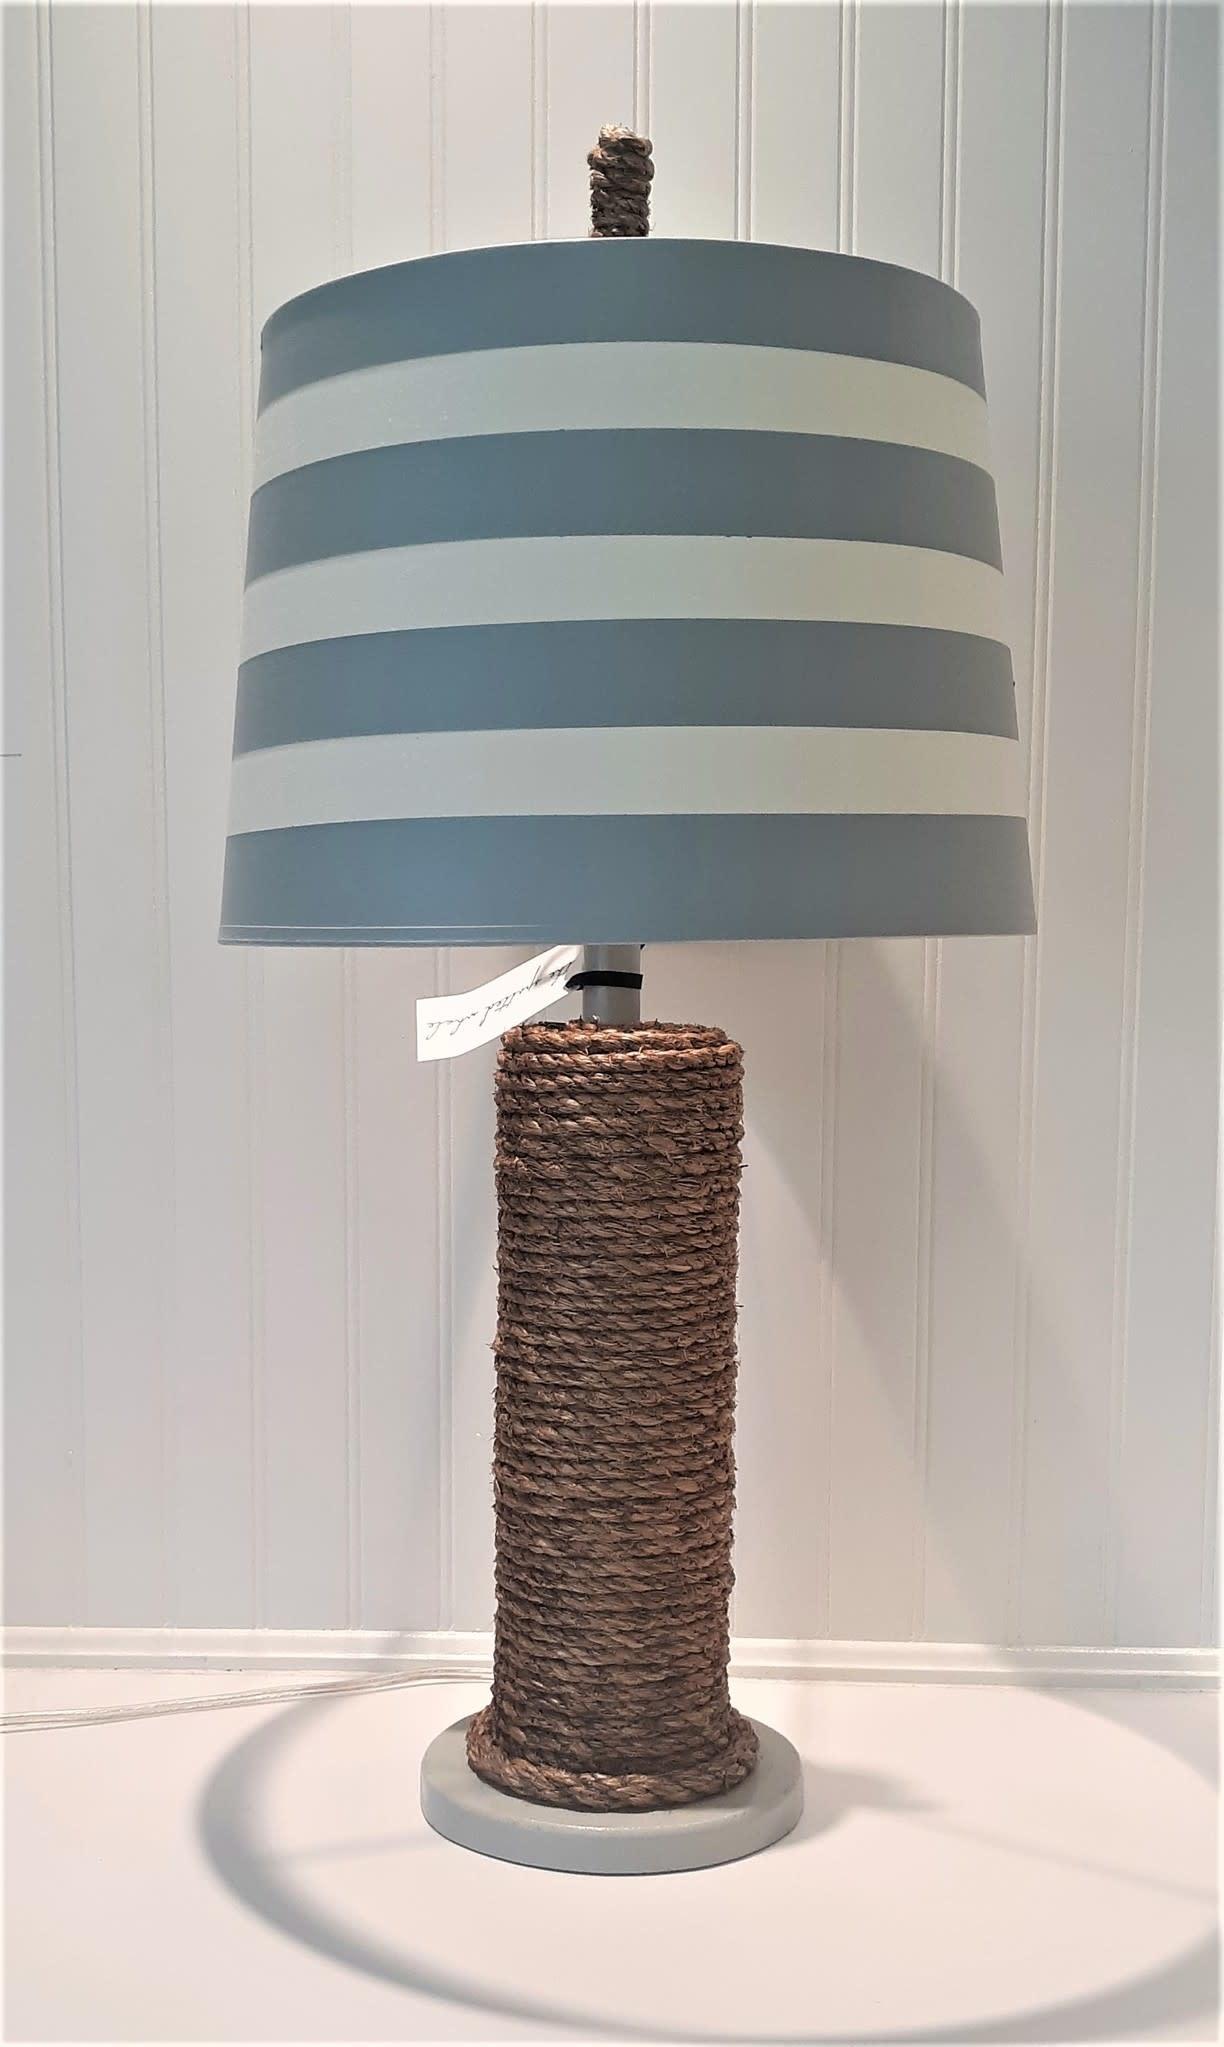 Manila Rope Spindle Lamp Pale Grey